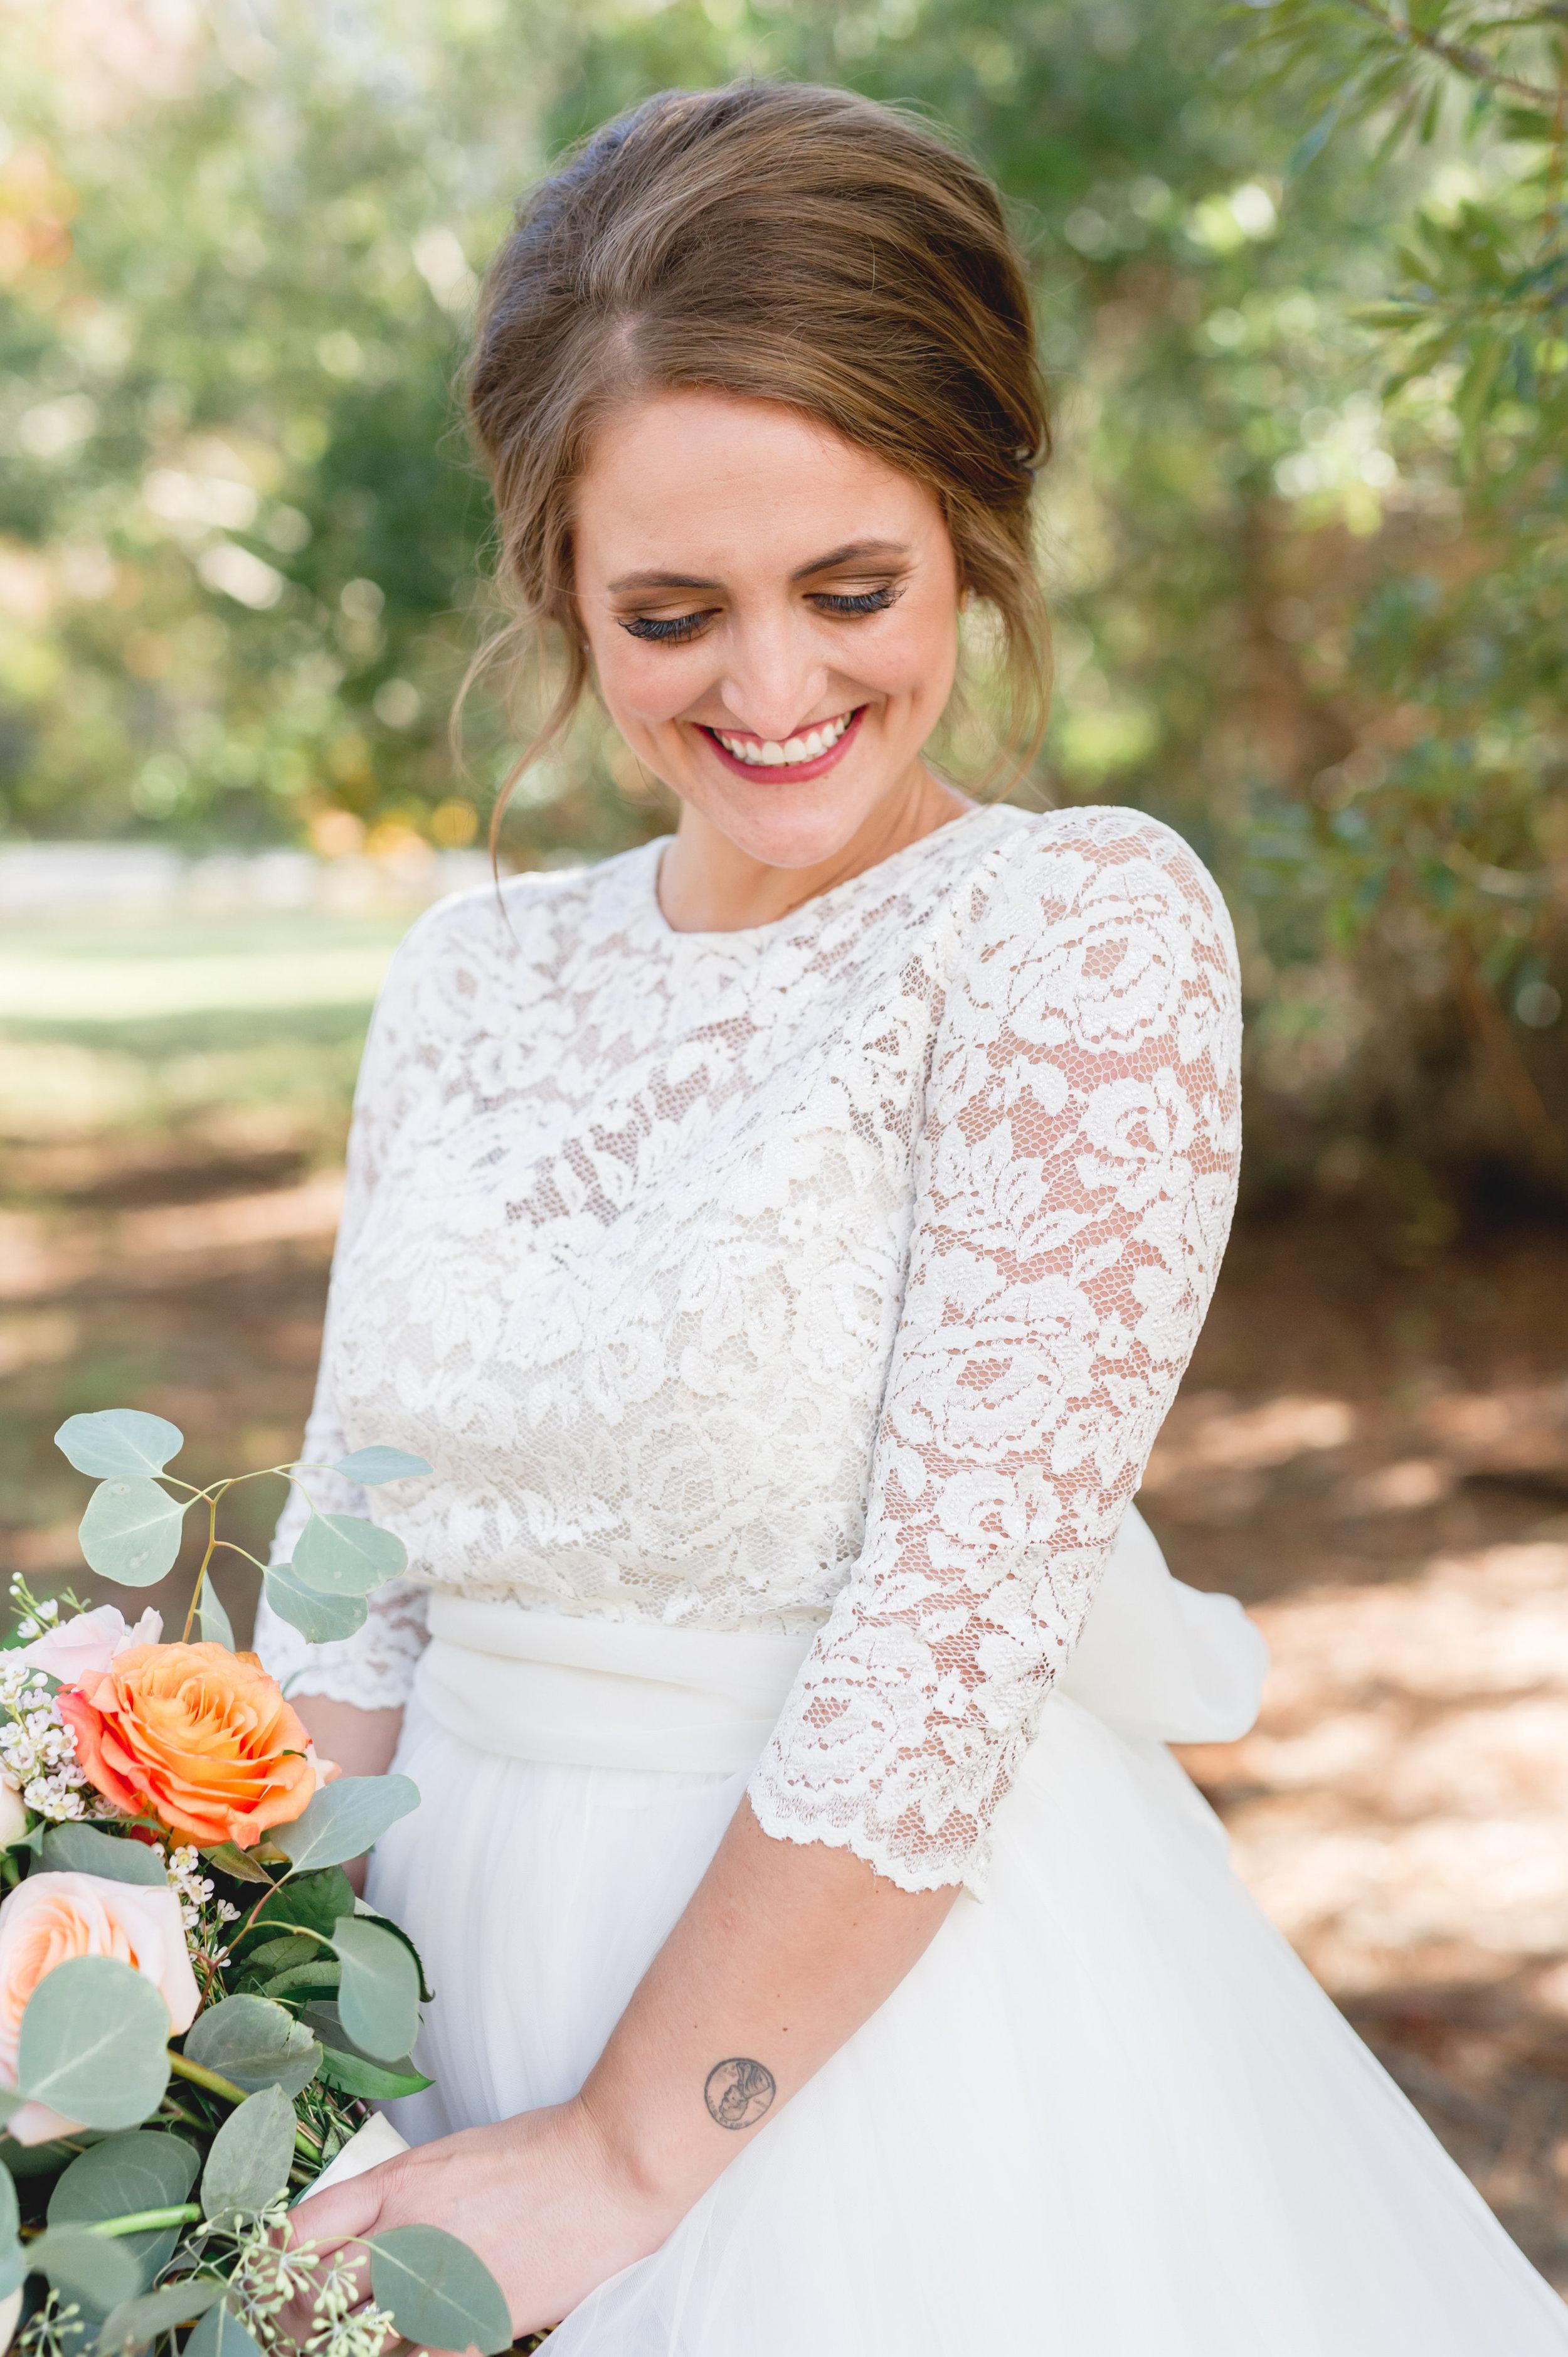 Joe Kendall Romantic Boho Wedding Gulf Shores AL-Bride and Groom-0023.jpg